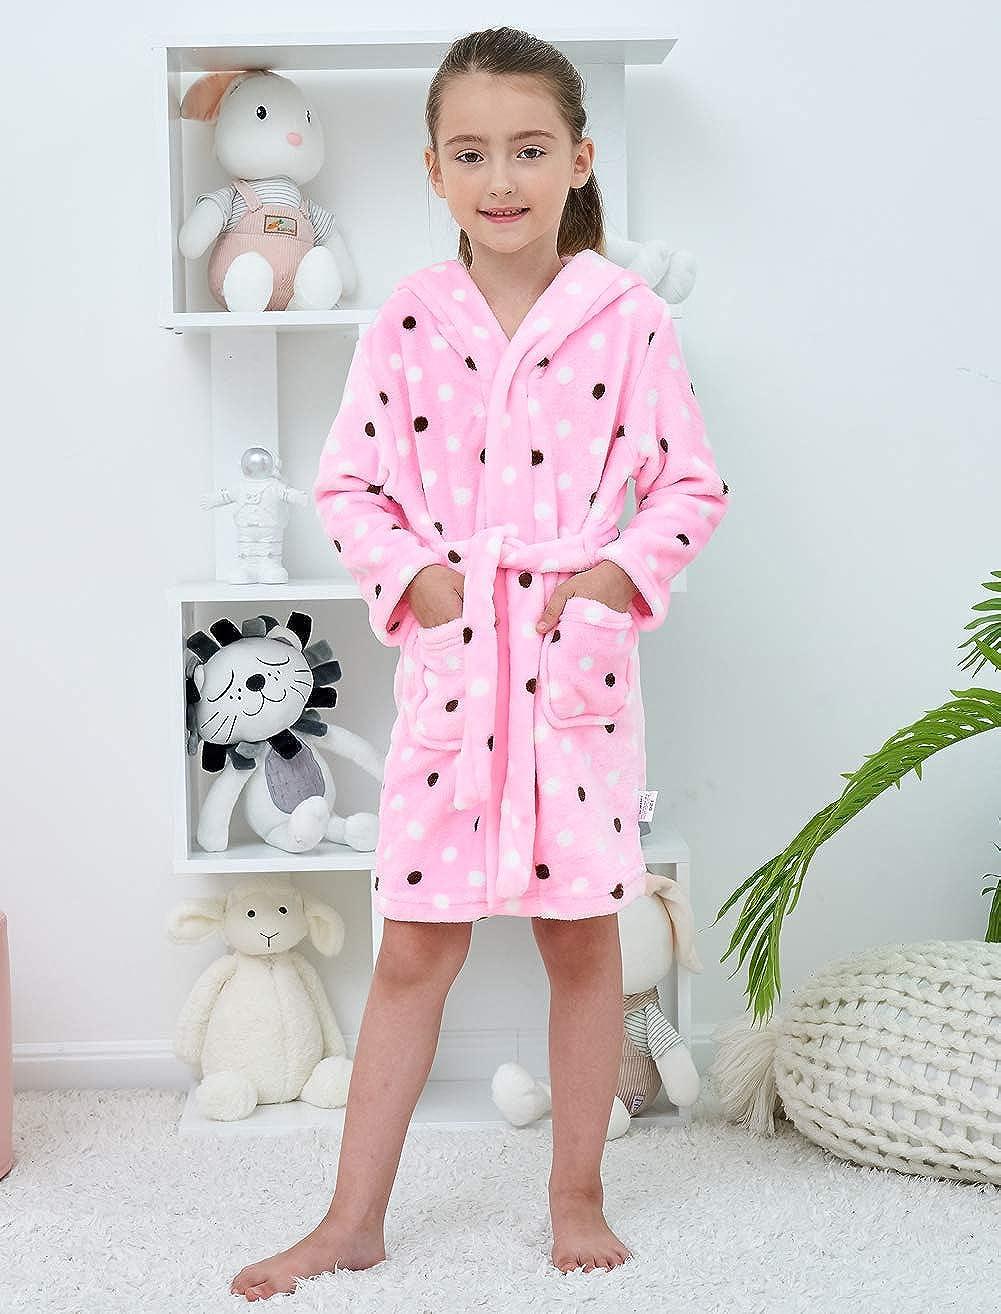 Tunoluker Boys Bathrobes, Toddler Kids Hooded Robes Soft Plush Fleece Pajamas Sleepwear for Boys & Girls: Clothing, Shoes & Jewelry